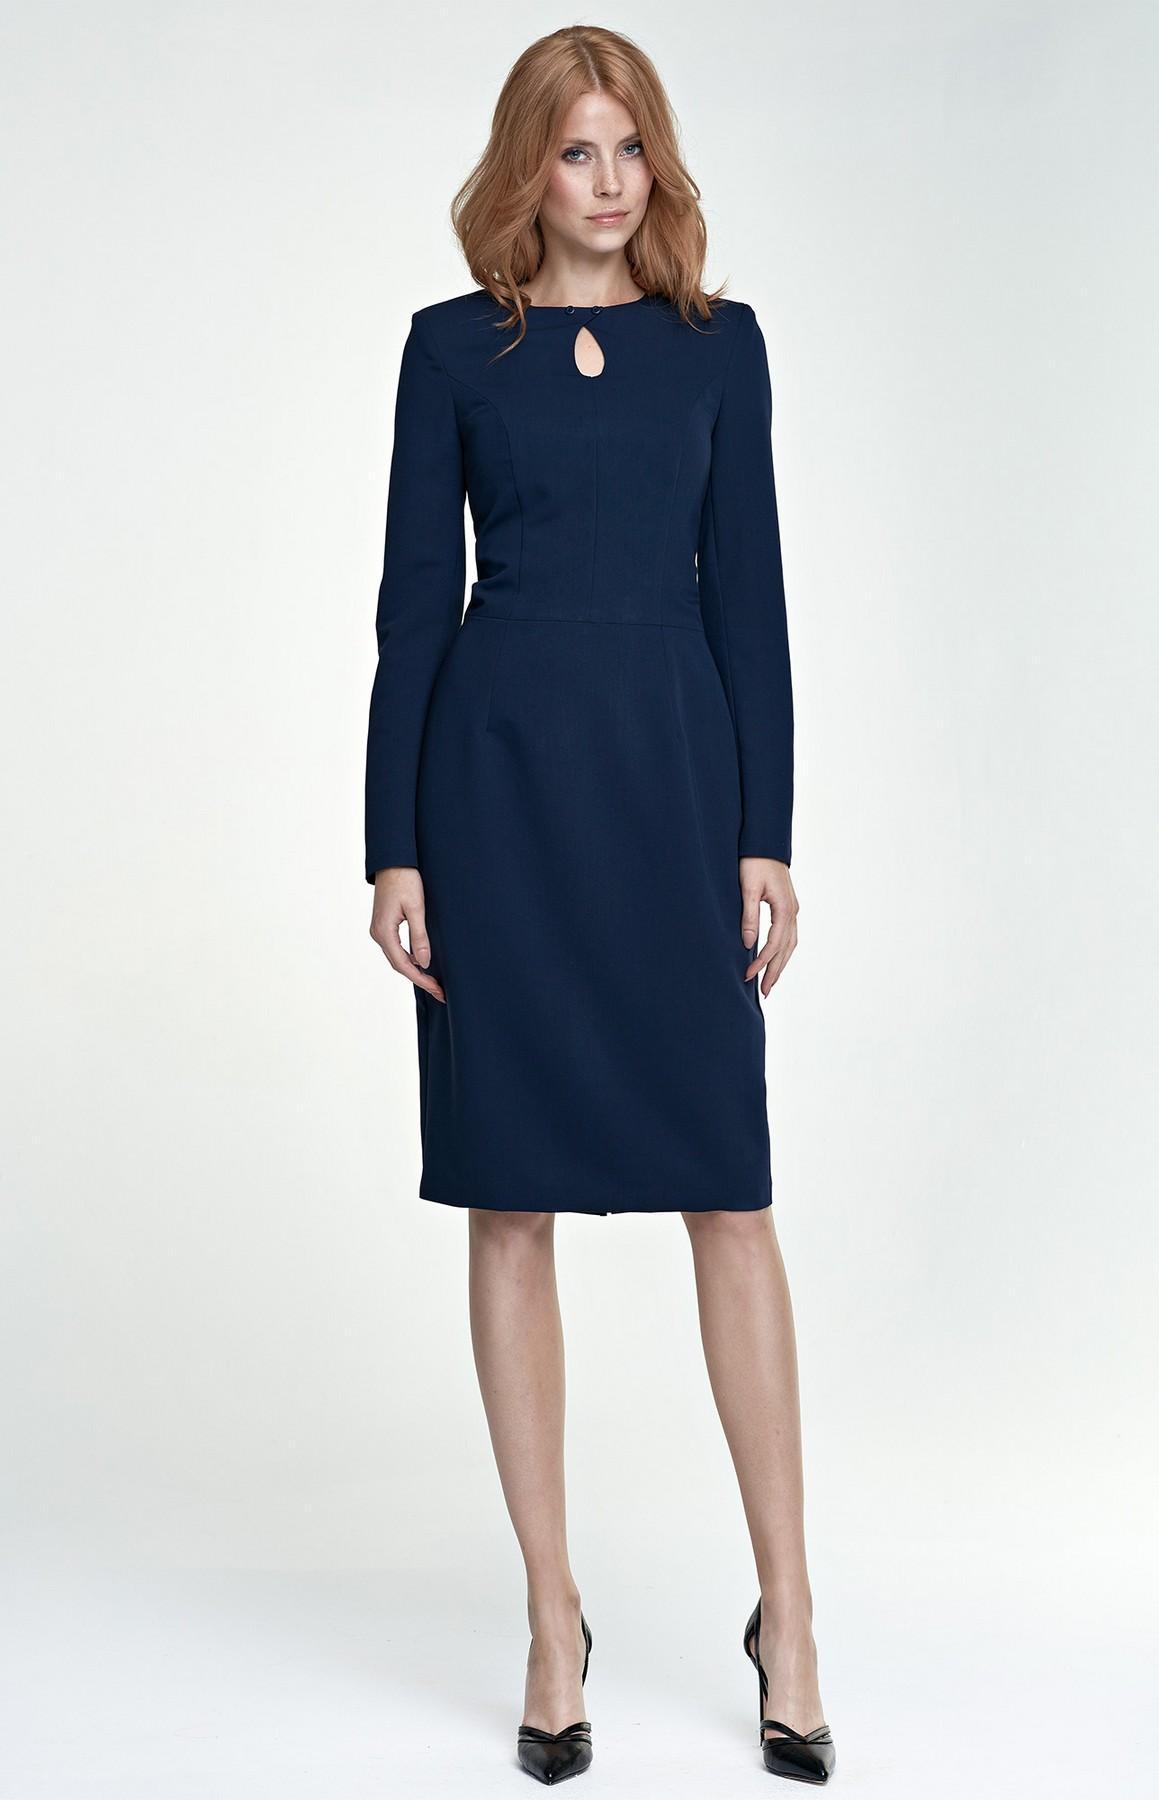 Robe bleu marine manches longues